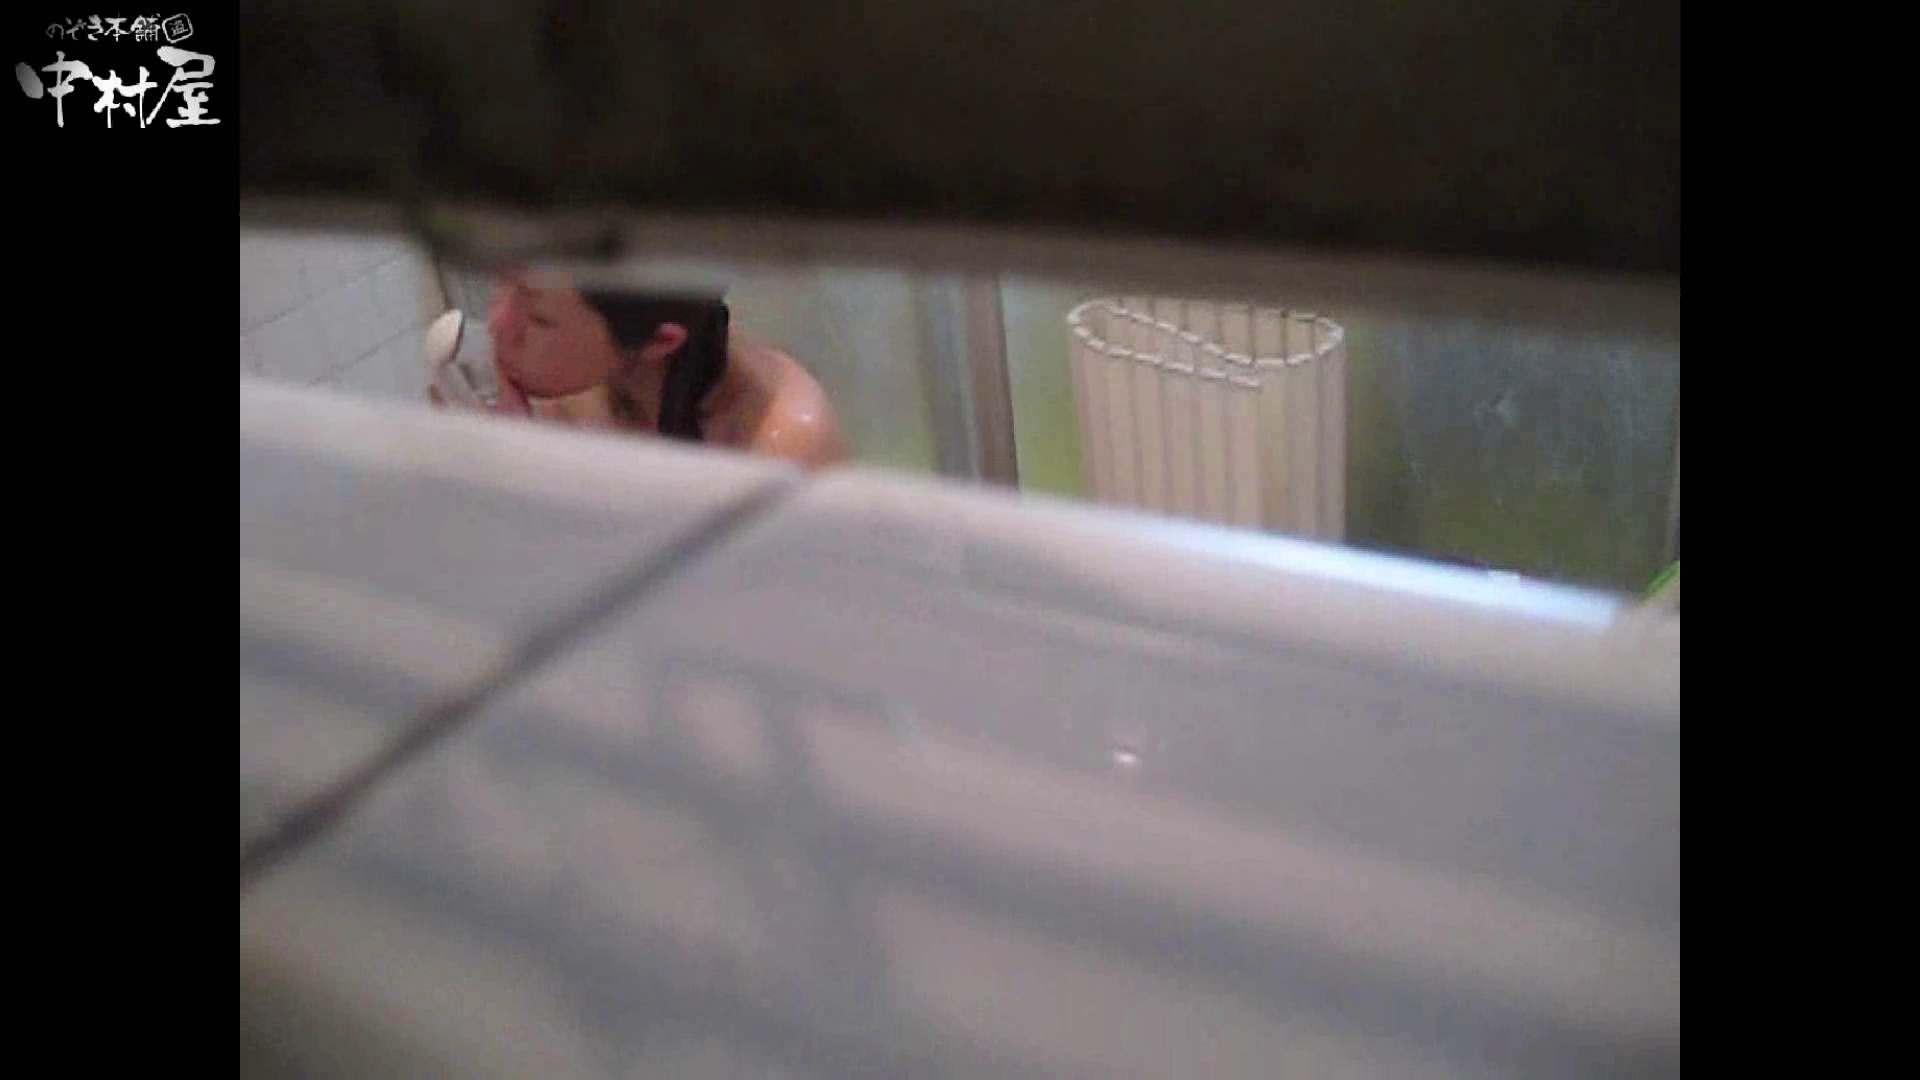 民家風呂専門盗撮師の超危険映像 vol.014後編 エロい美少女 セックス無修正動画無料 113PIX 94